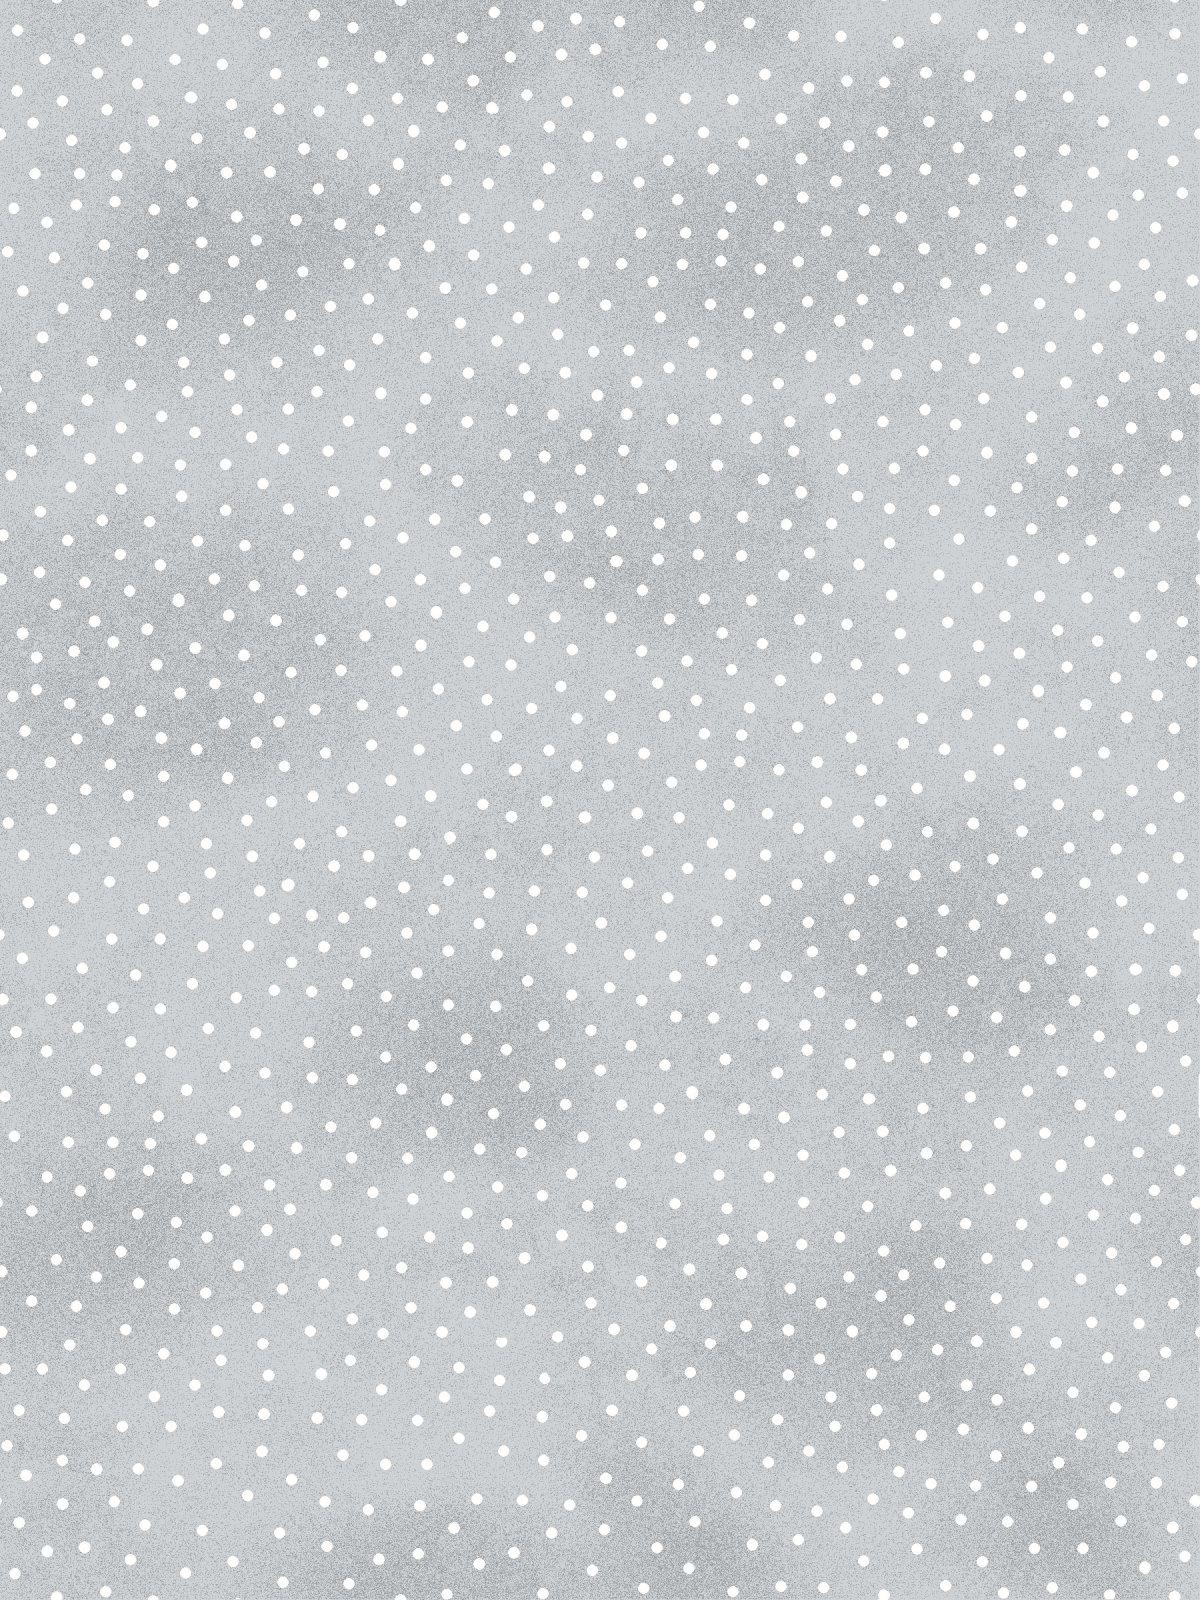 AE-Comfy Flannel Print 9527-99 Grey Dots